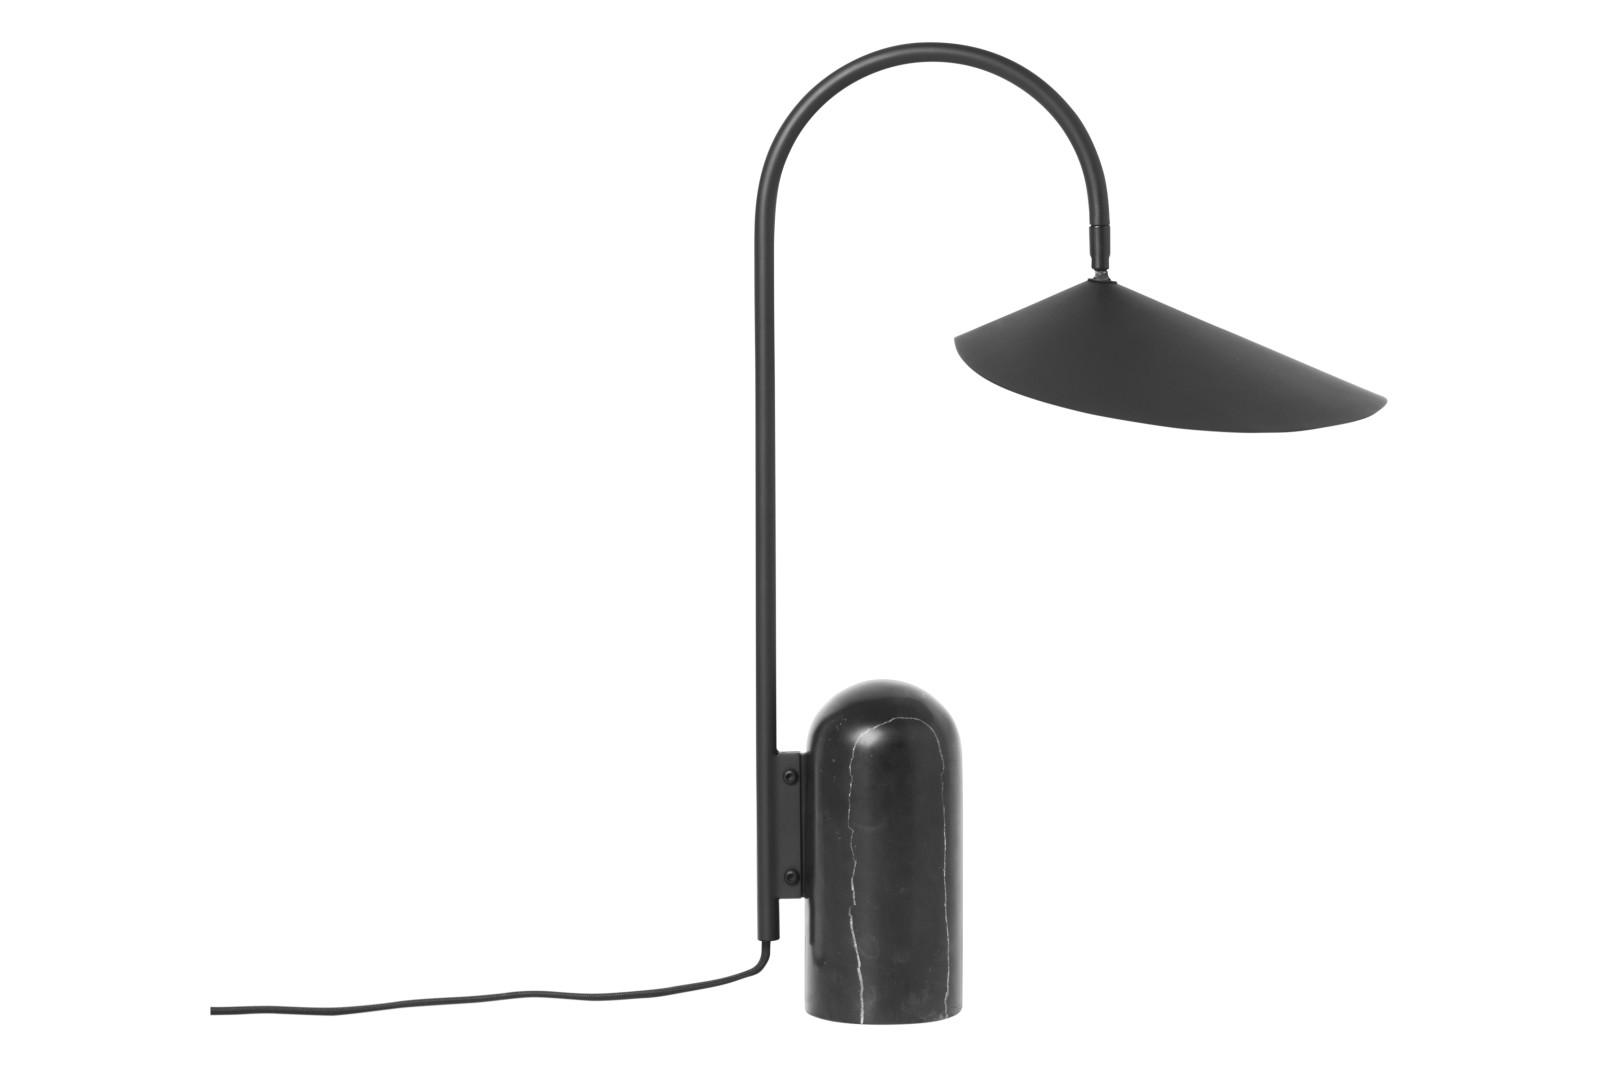 Arum Table Lamp Arum Table Lamp - Black